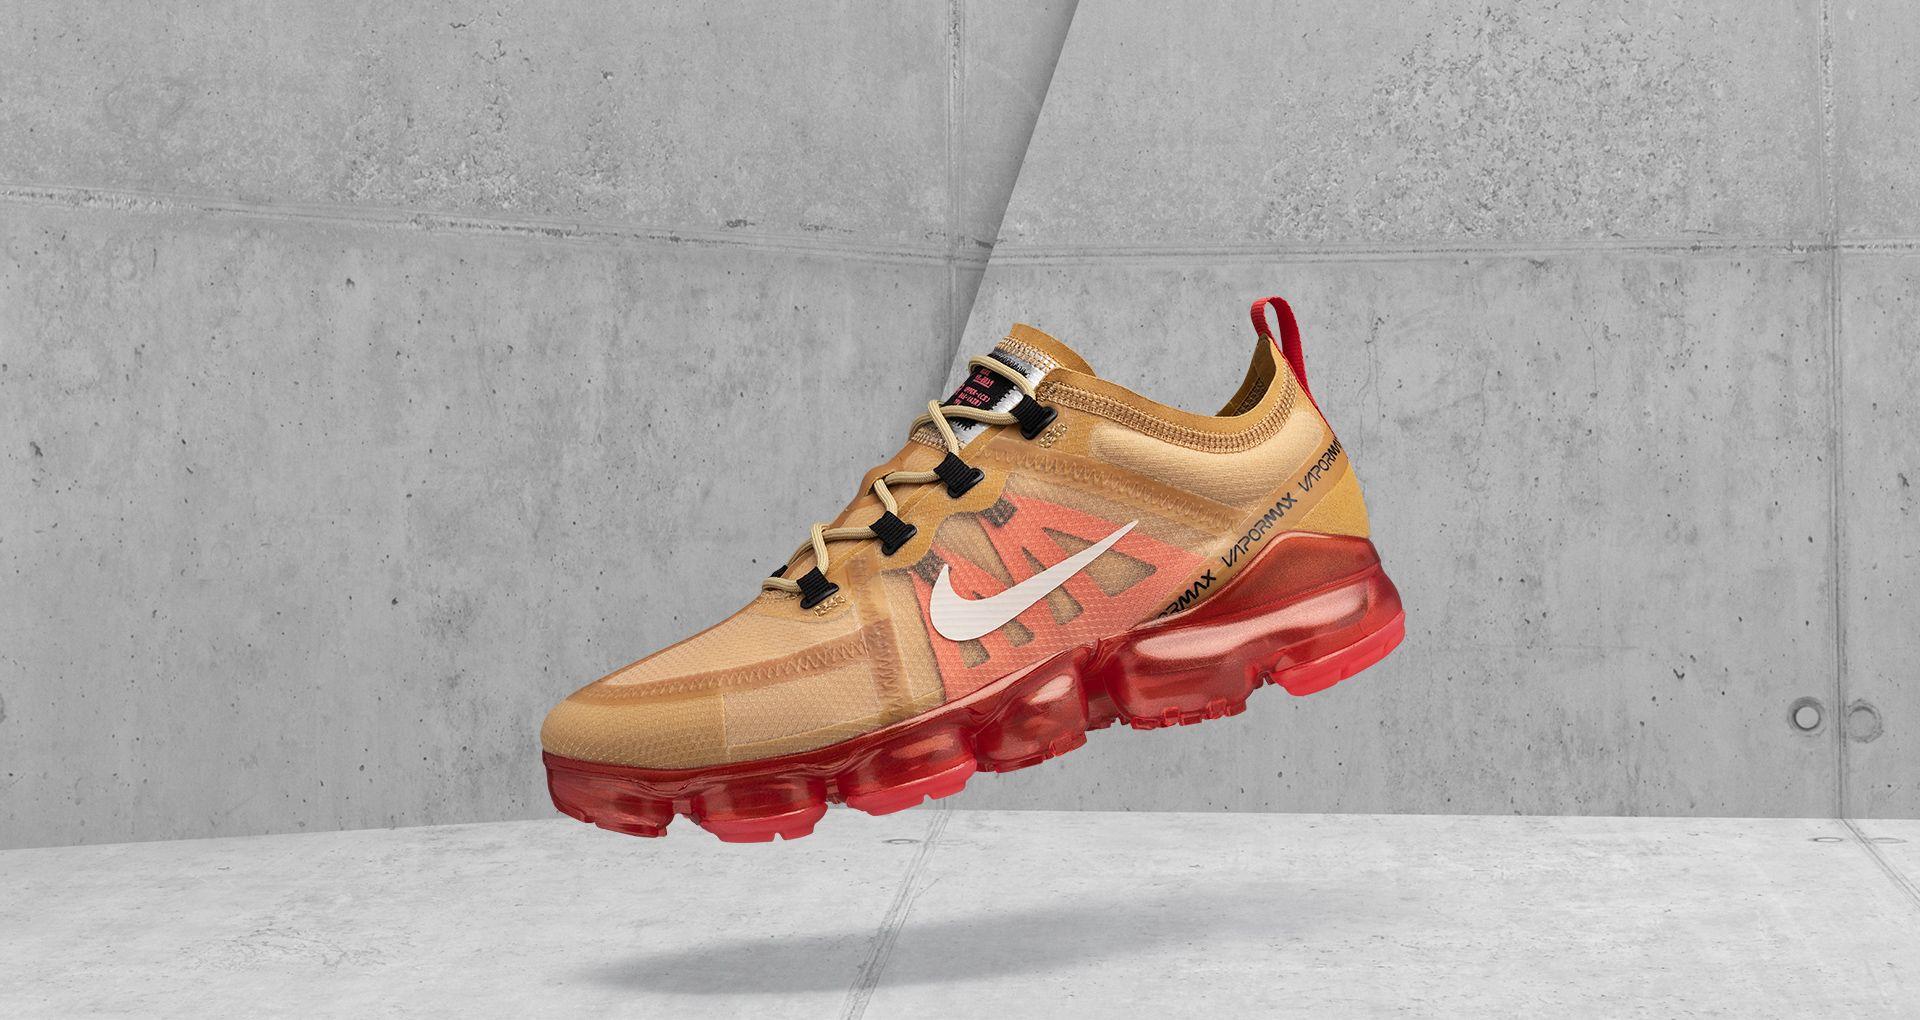 san francisco 4ff50 69b78 Nike Air Vapormax 2019 'Club Gold & Ember Glow' Release Date ...